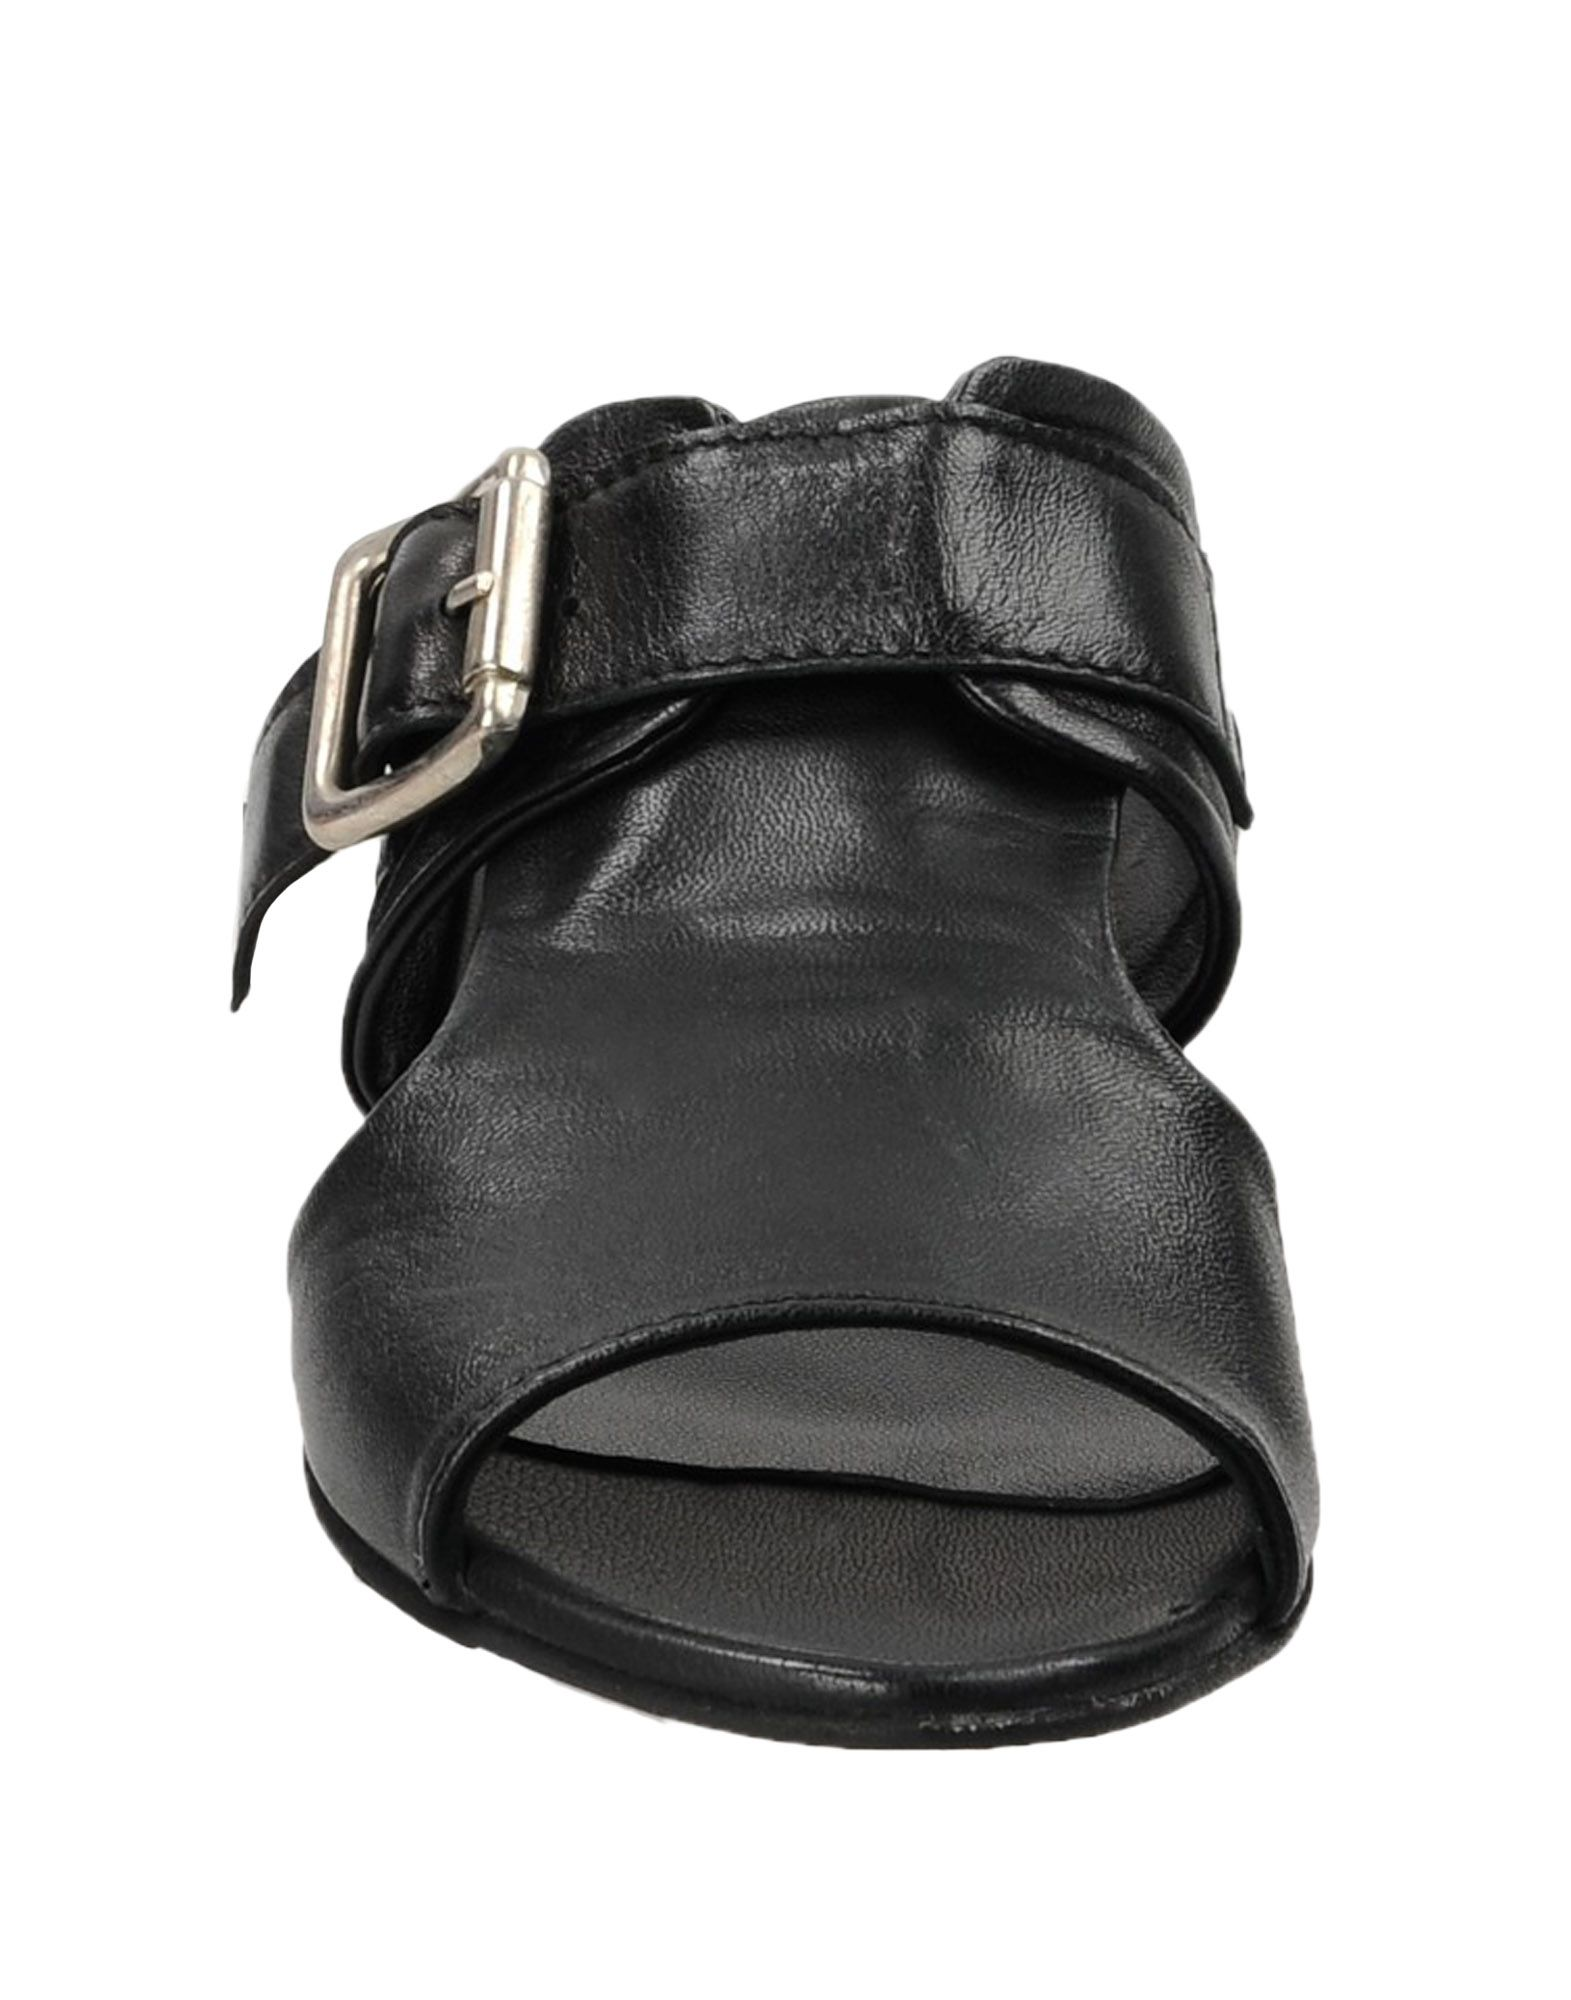 Get It Sandalen Damen  11437059KL Gute Qualität beliebte Schuhe